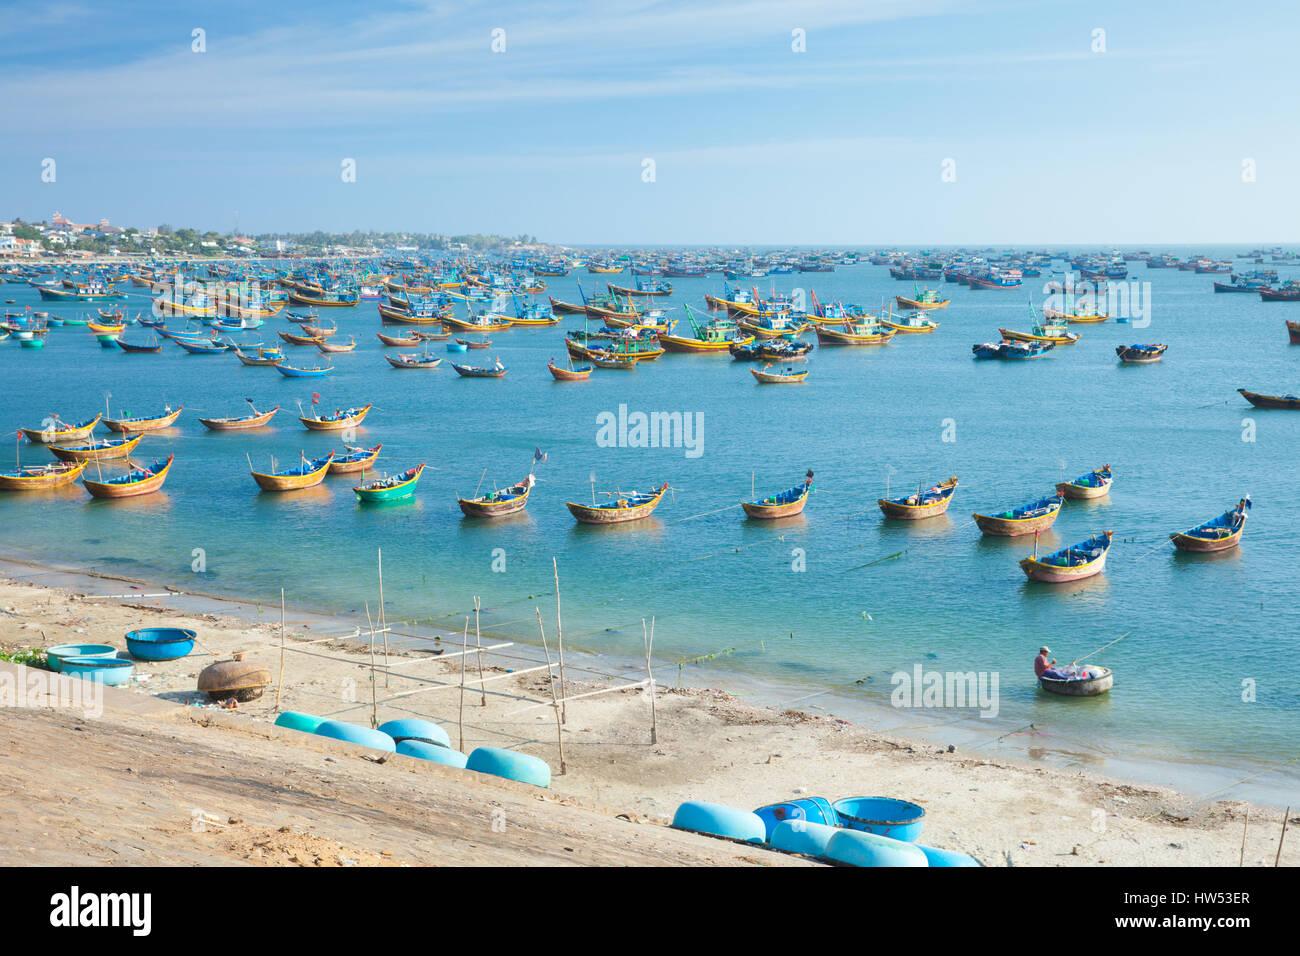 A lot of fishing boats near fisherman village in rural area of Mui Ne, Southern Vietnam. - Stock Image